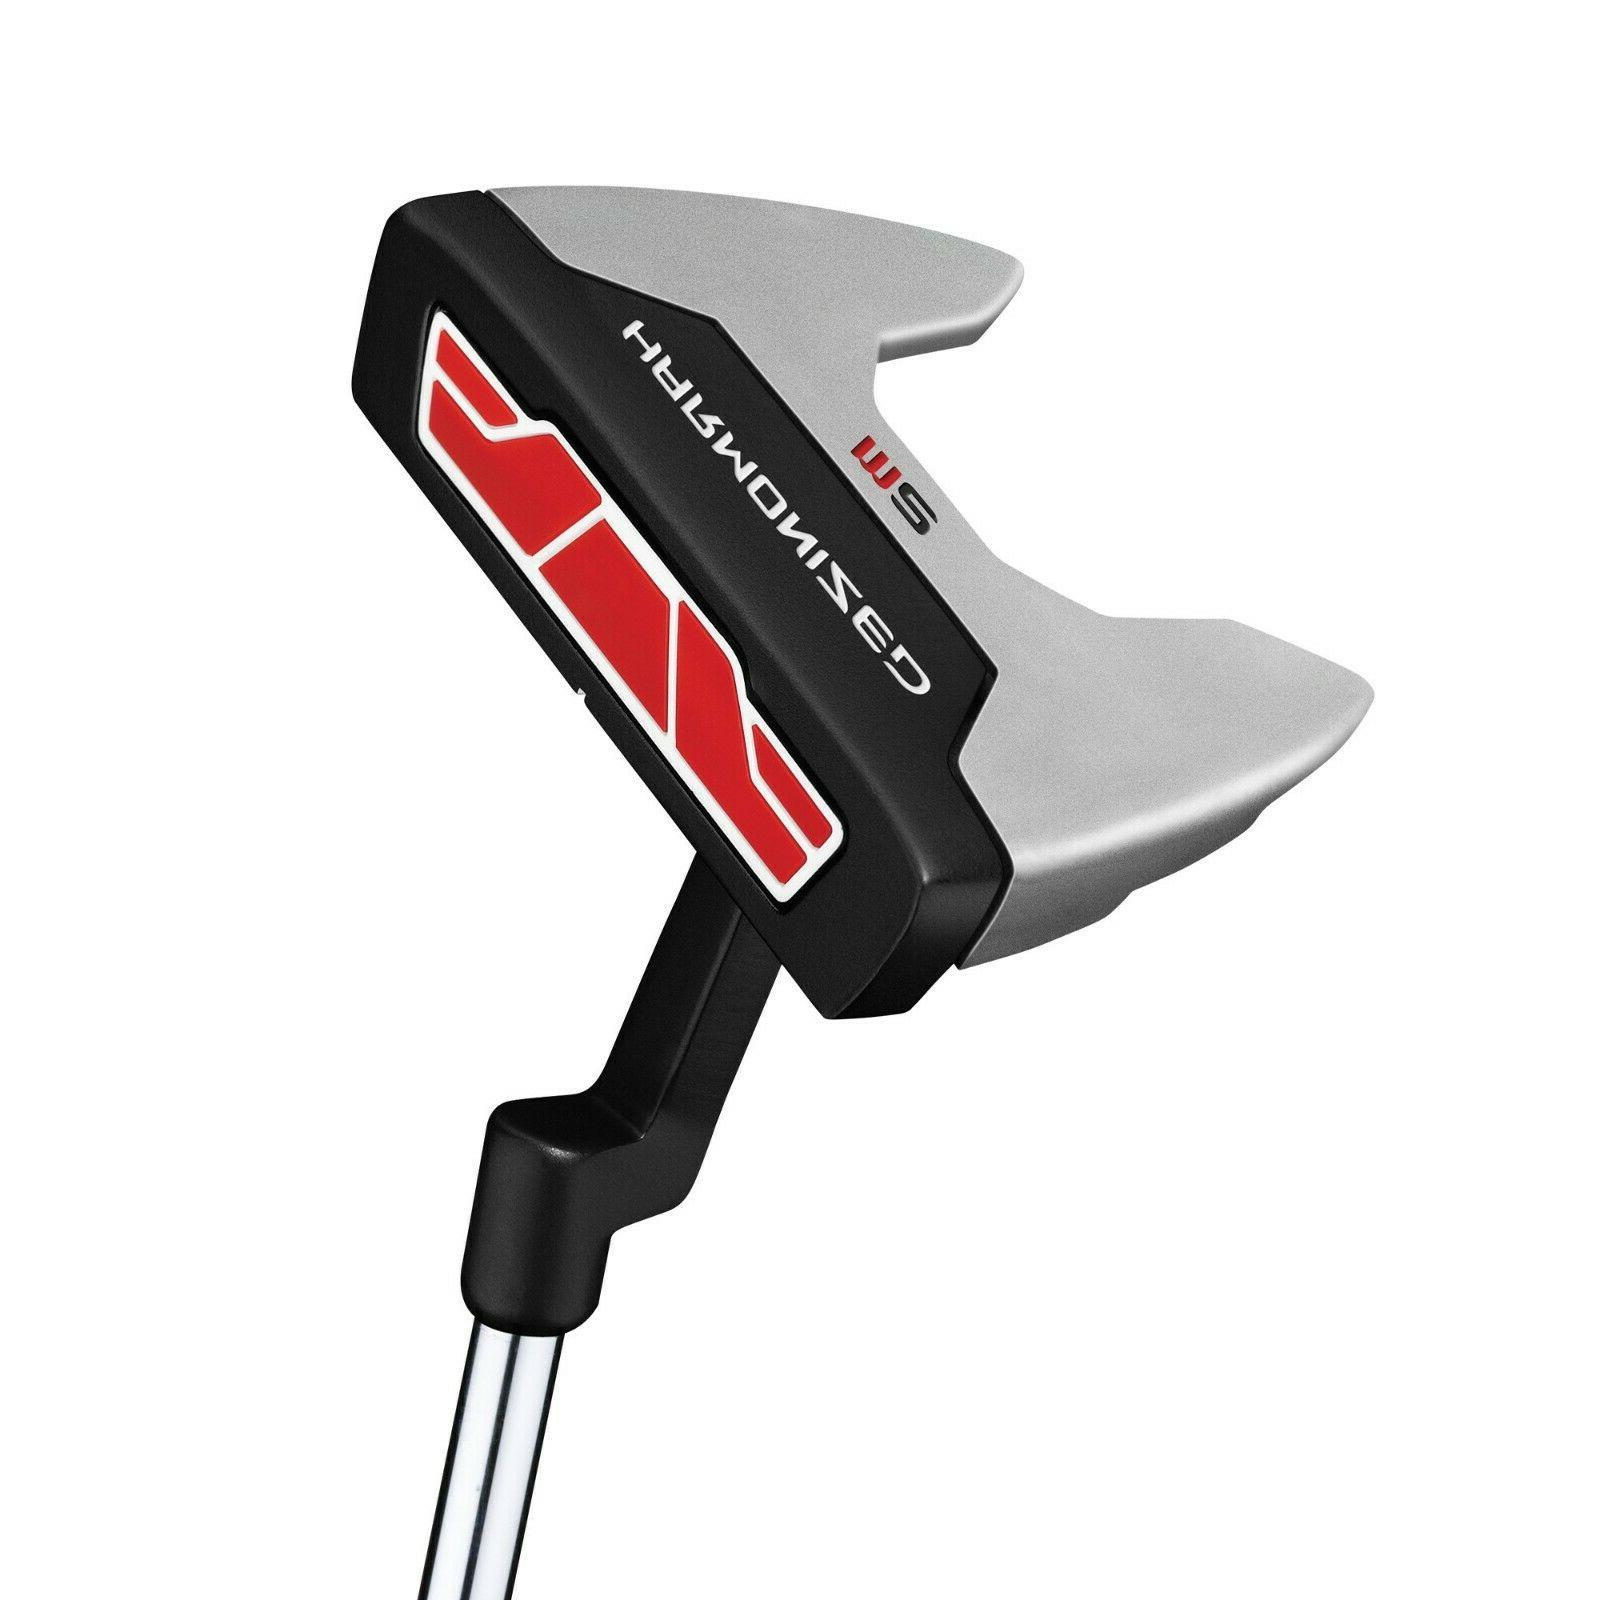 new wilson harmonized m2 golf putter 2019